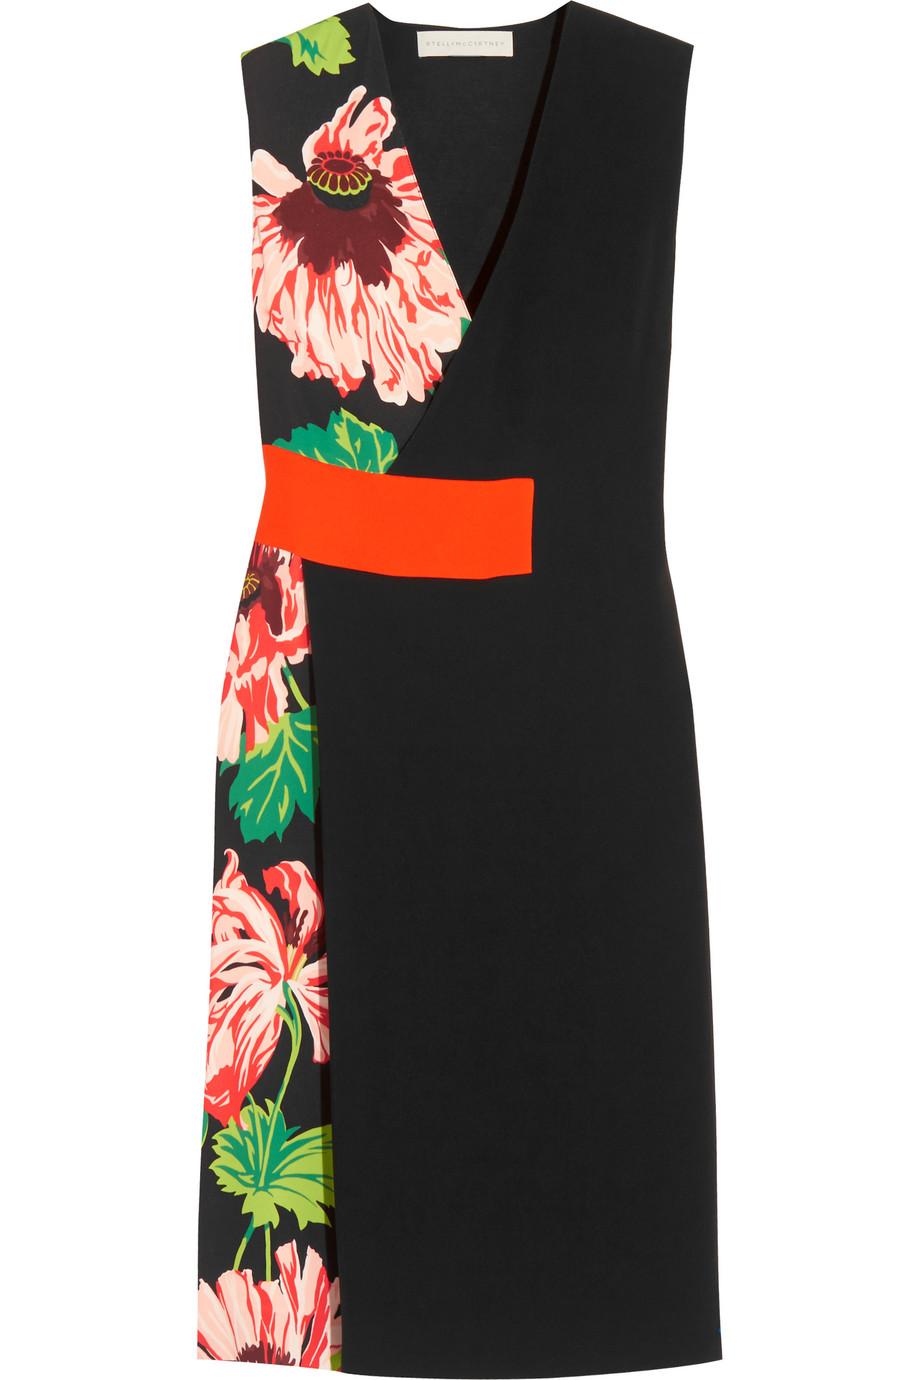 Stella Mccartney Agnes Floral-Print Stretch-Crepe Wrap-Effect Dress, Black/Green, Women's - Floral, Size: 36